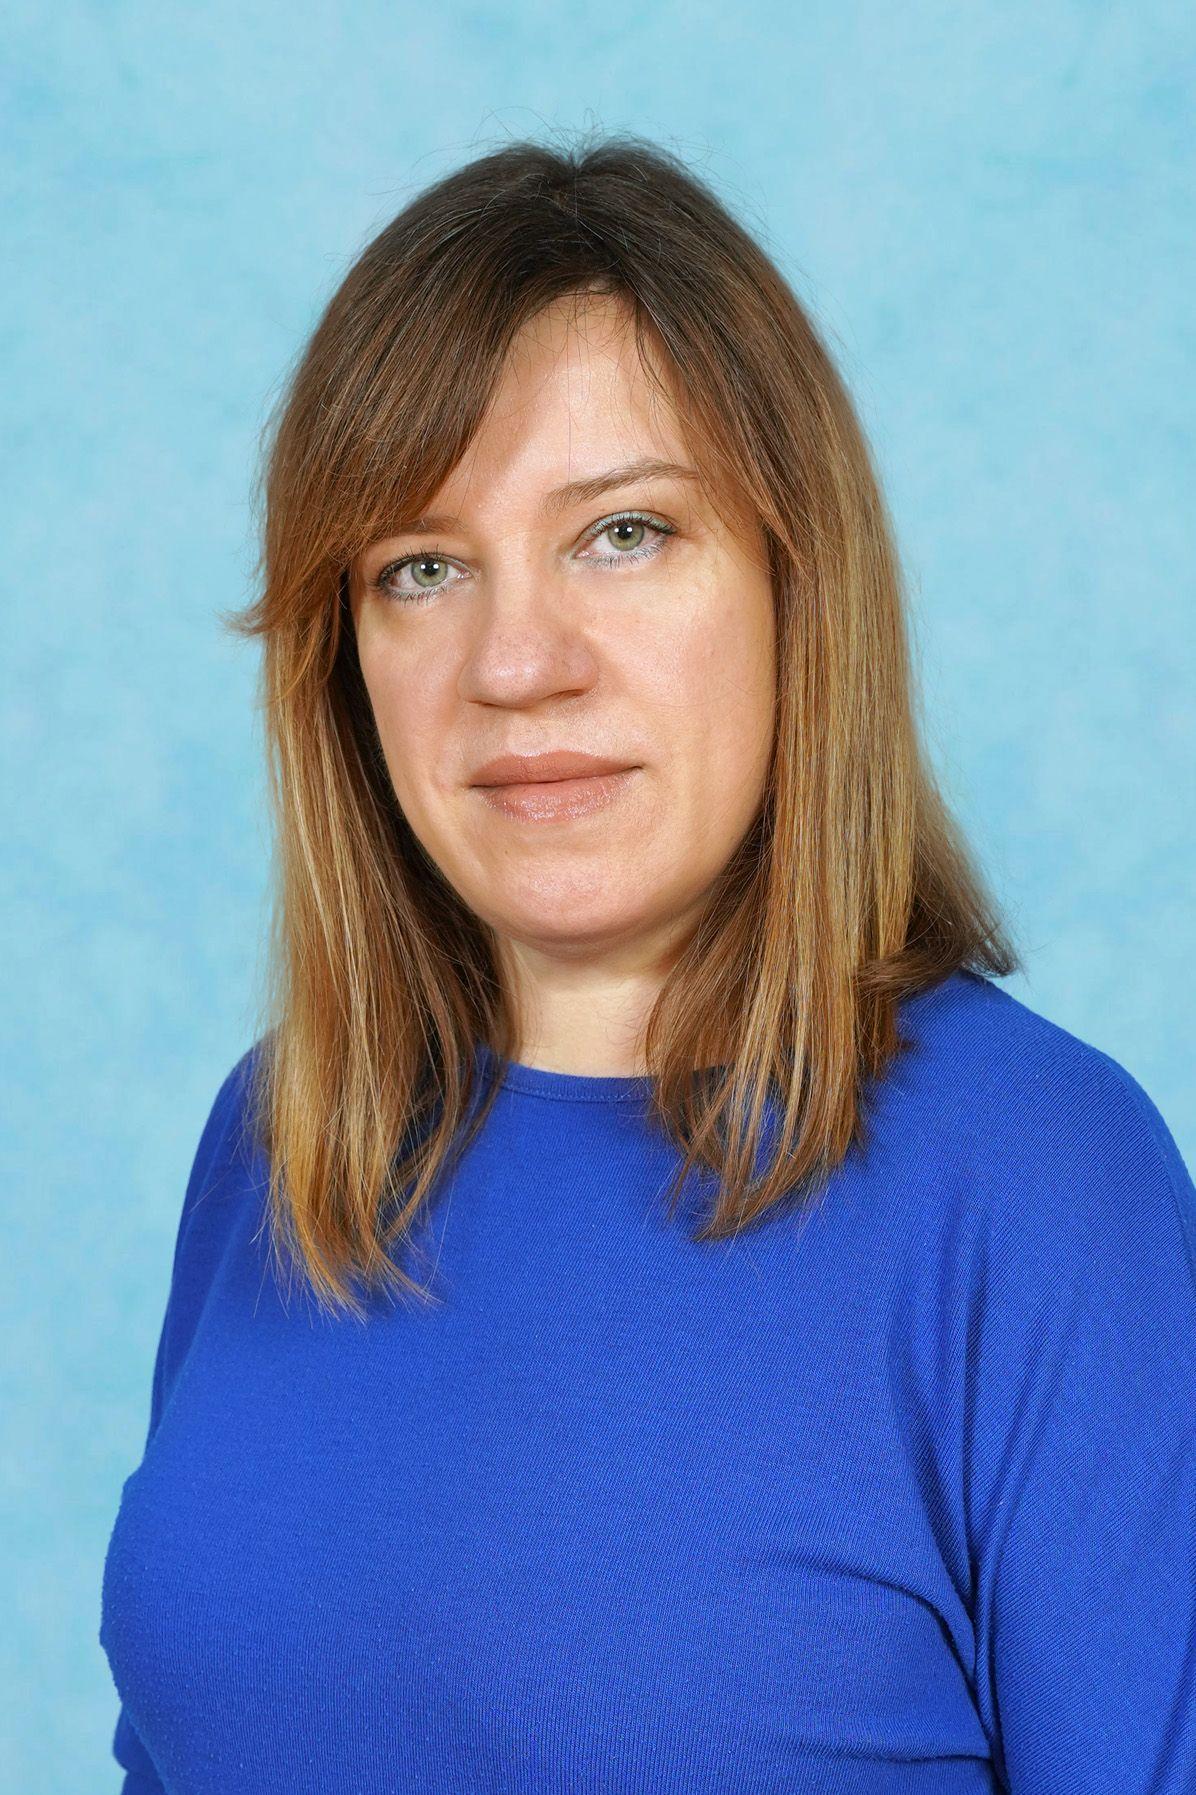 Федорова Наталья Александровна